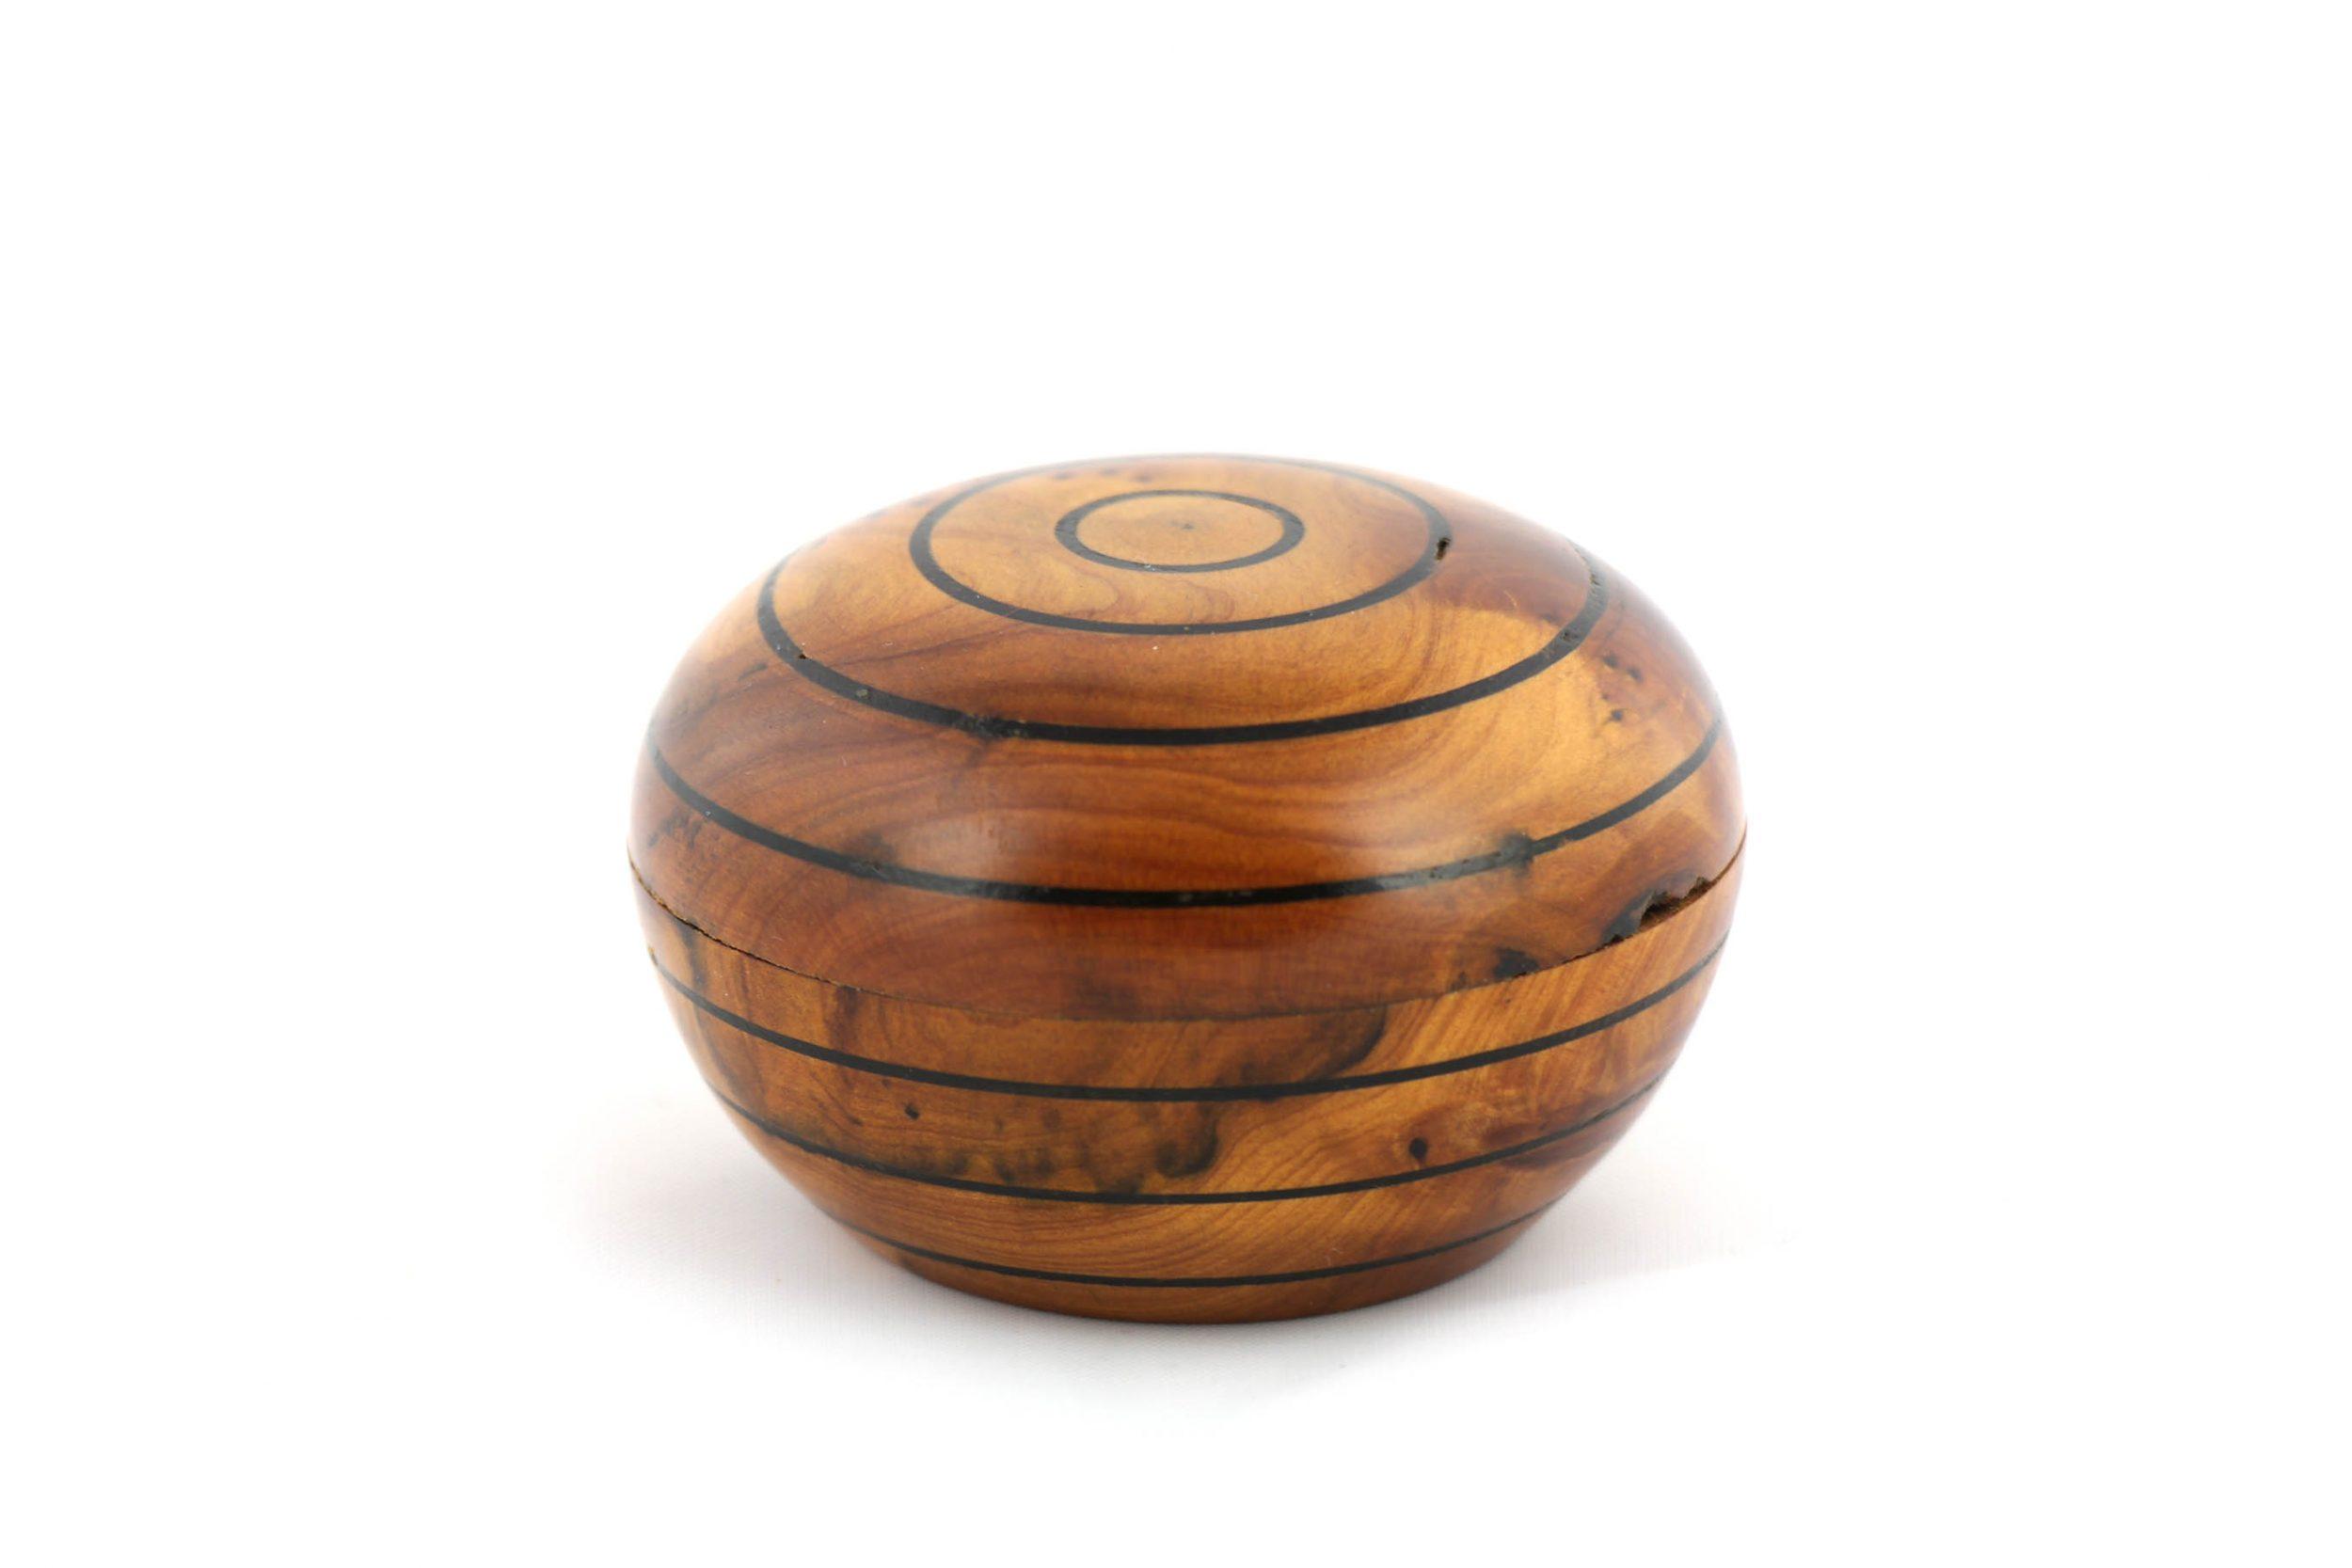 bwata souiria petite boite en bois de thuya d essaouira. Black Bedroom Furniture Sets. Home Design Ideas